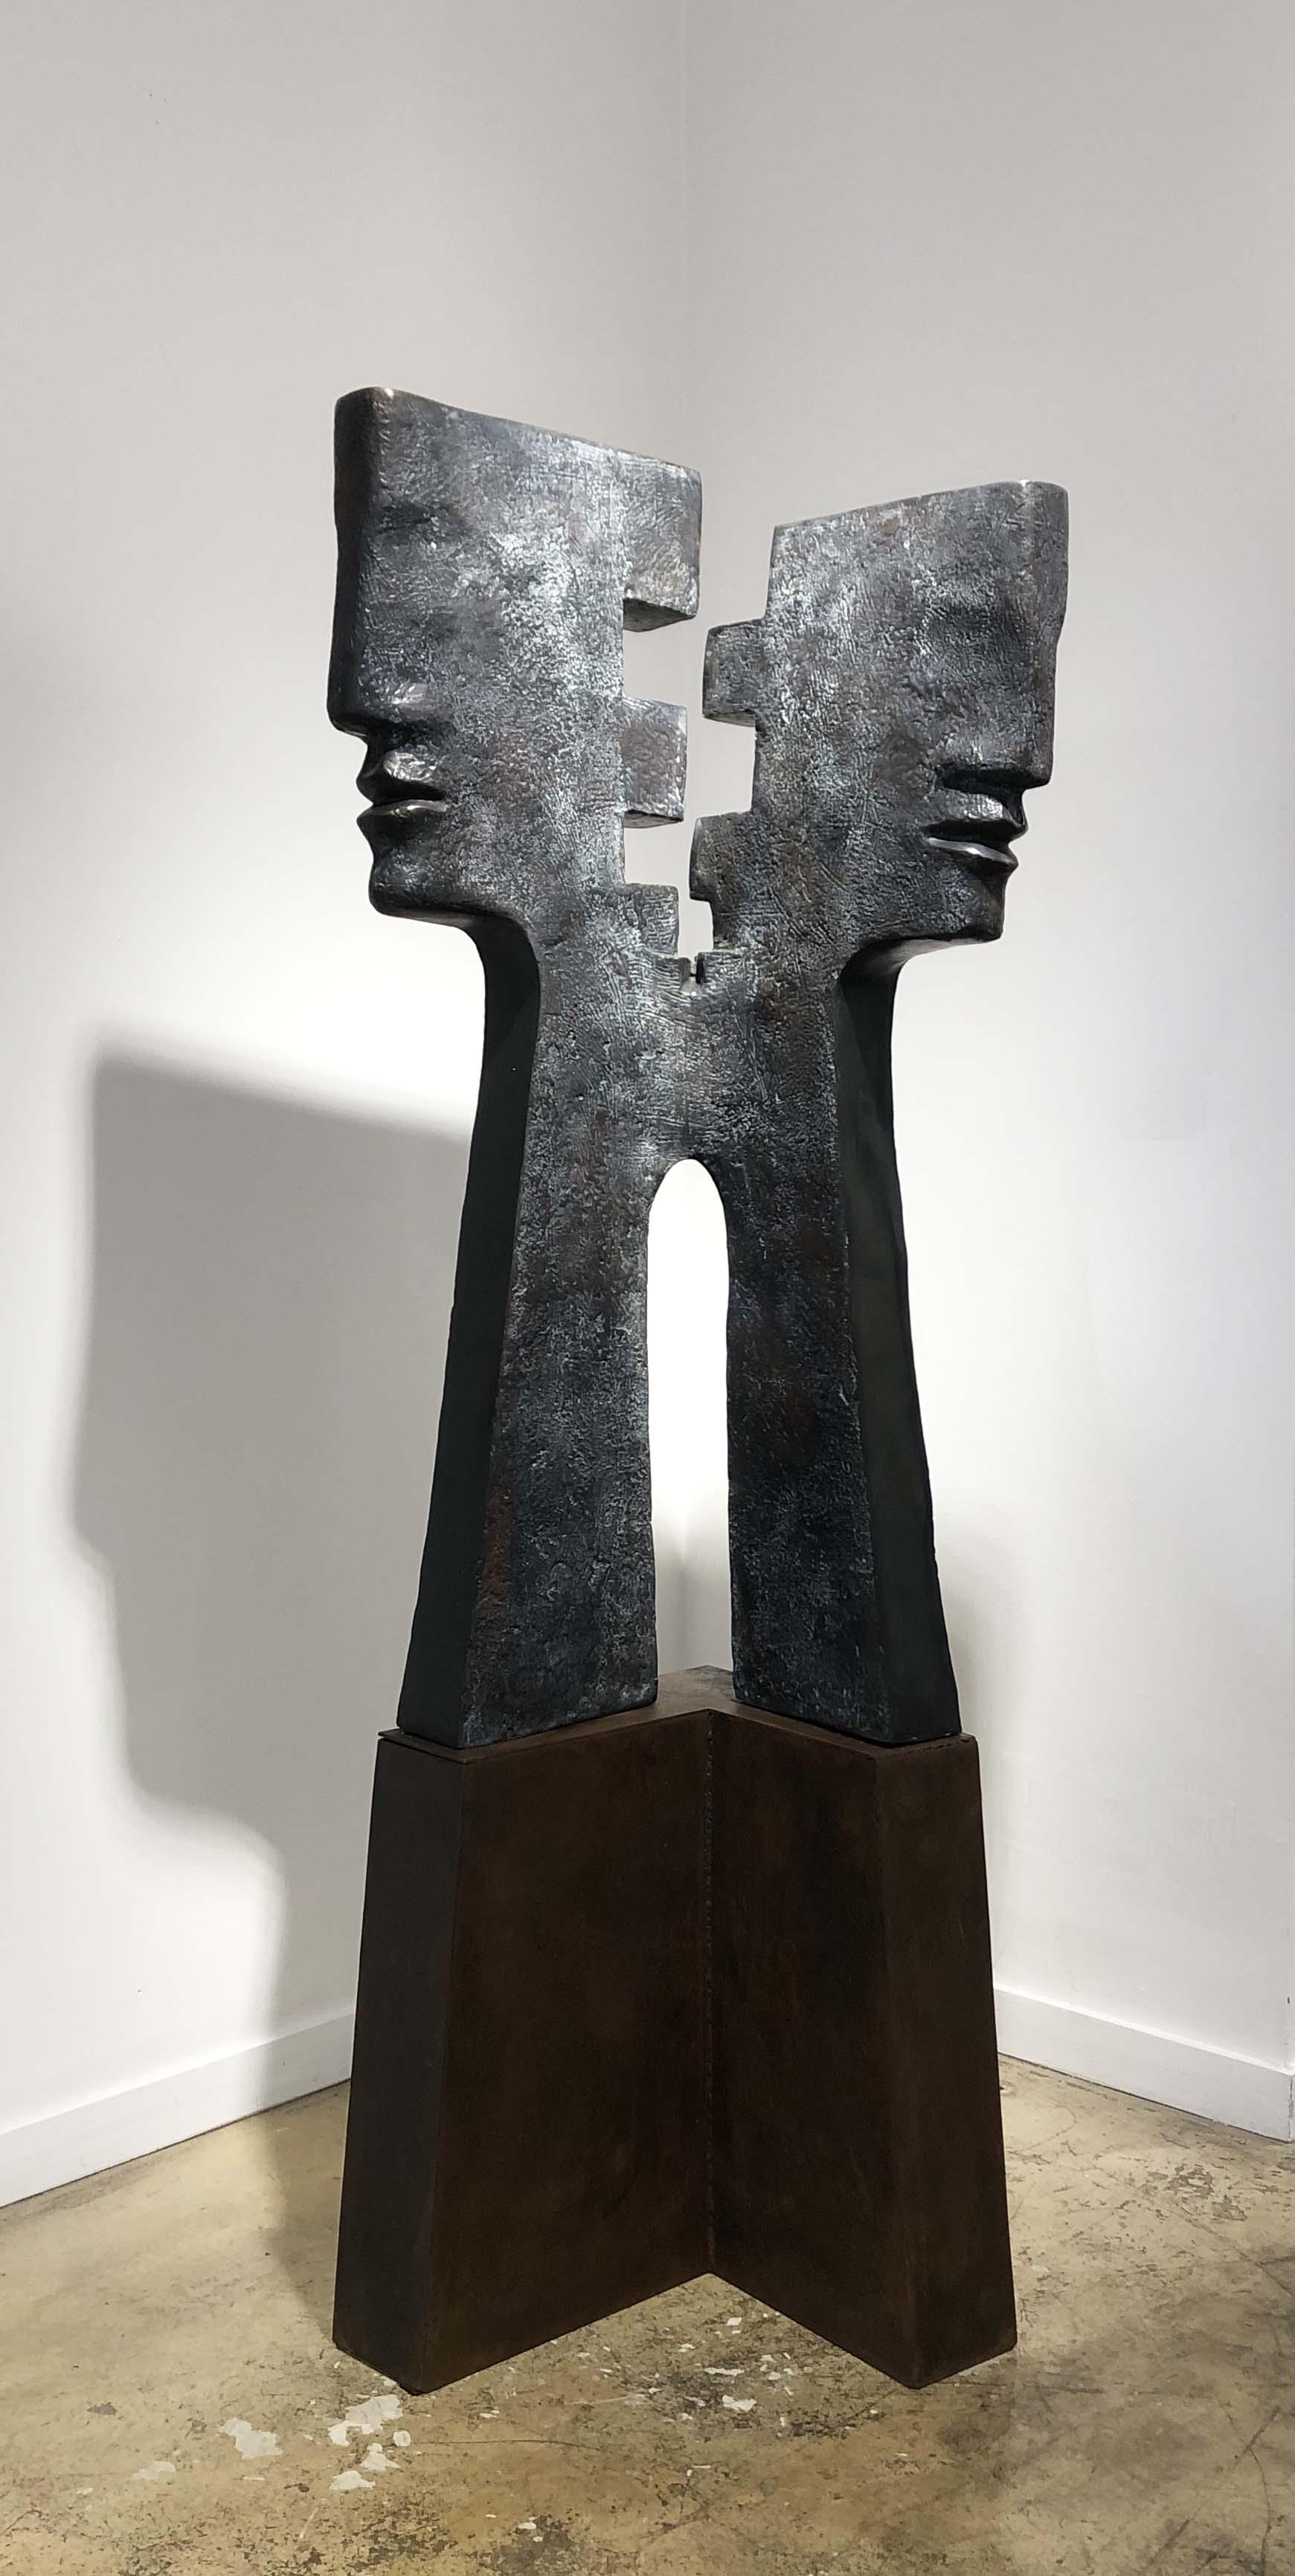 EPSILON Bronze 159x55x53cm / 62,5x21,6x20,8 inches & 250x100x60cm/98.4x39.3x23.6 inches